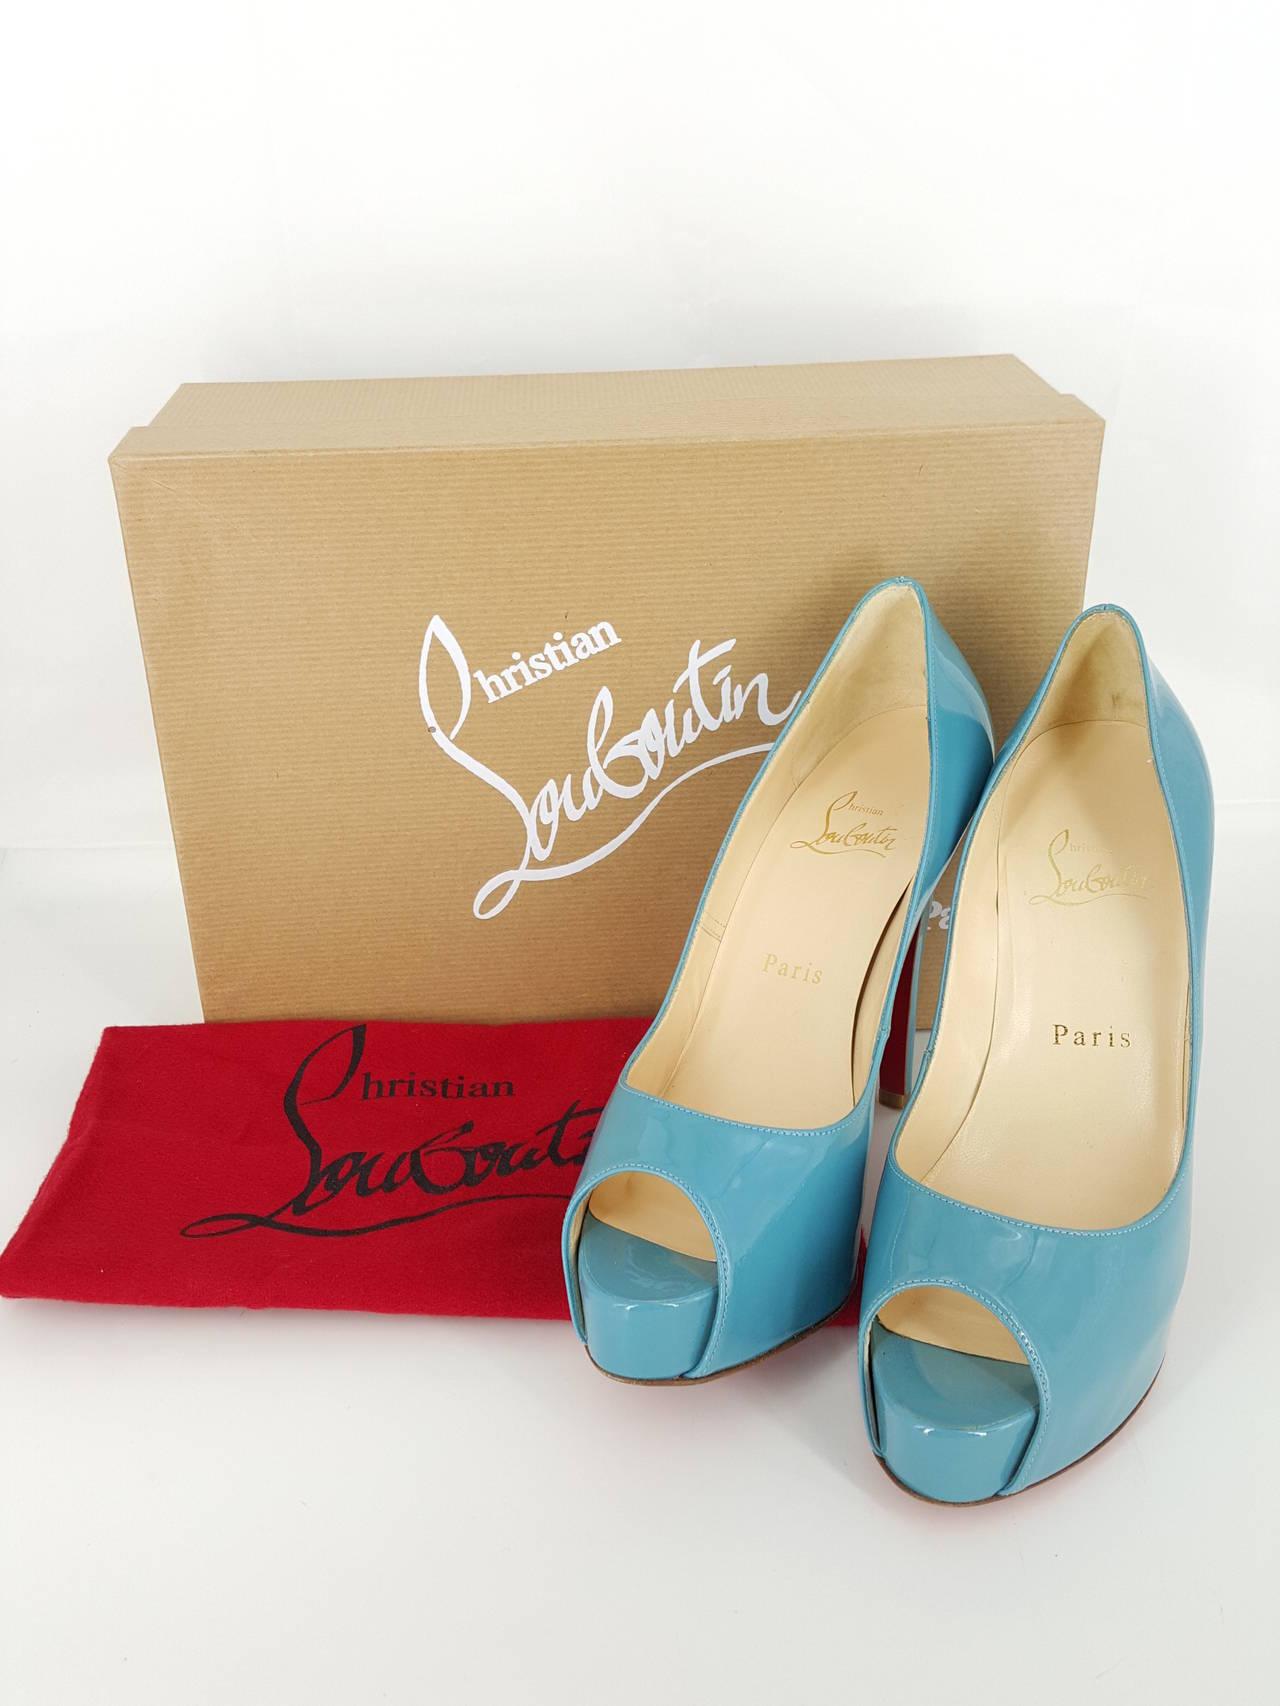 "Christian Louboutin Turquoise Patent Leather Peep Toe Pumps.  Size 36 1/2"" 5"